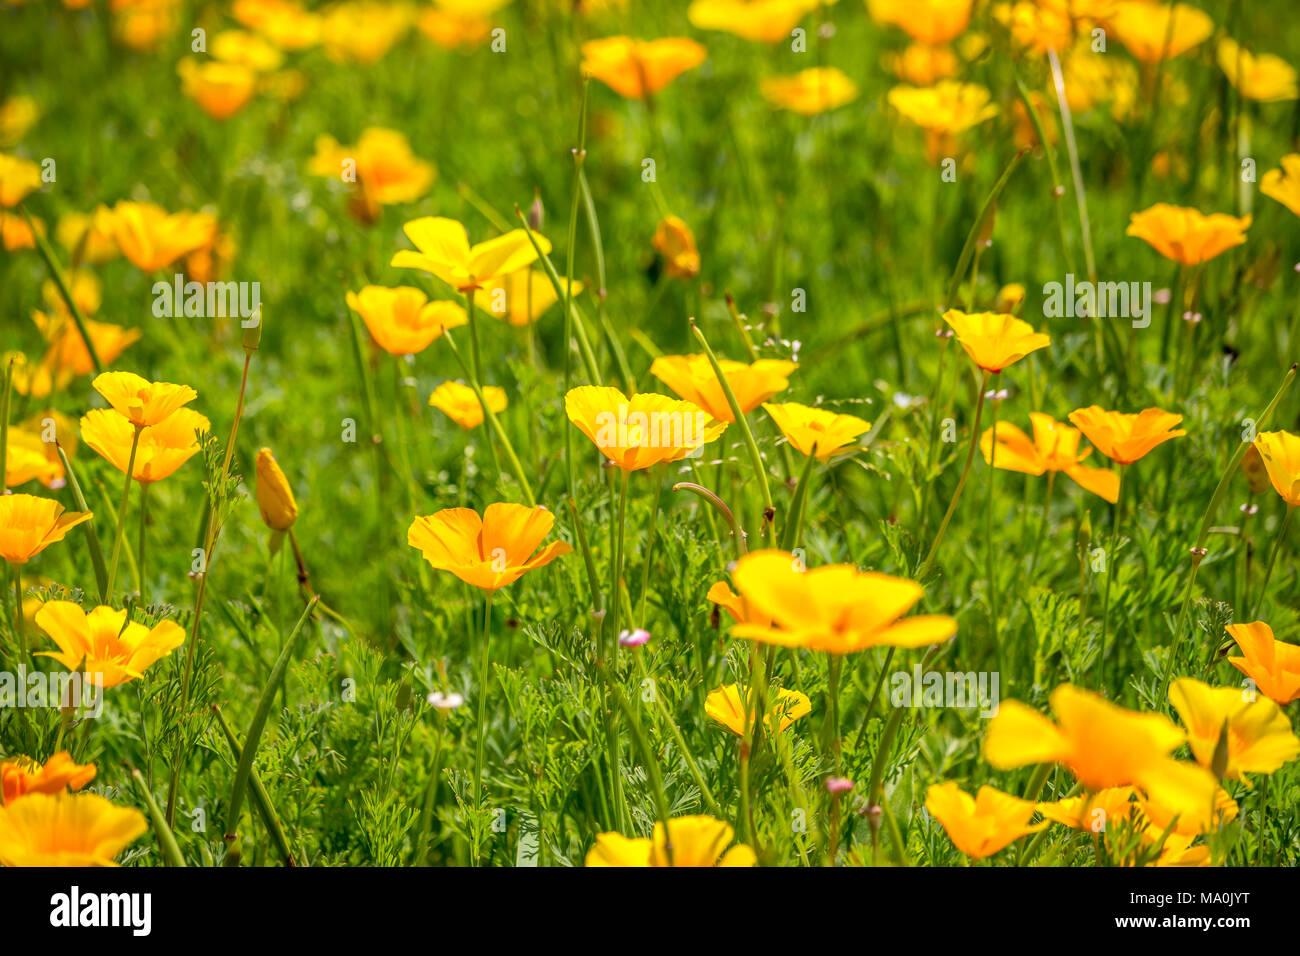 Stunning Buttercup Yellow Flowers Of Eschscholzia Californica